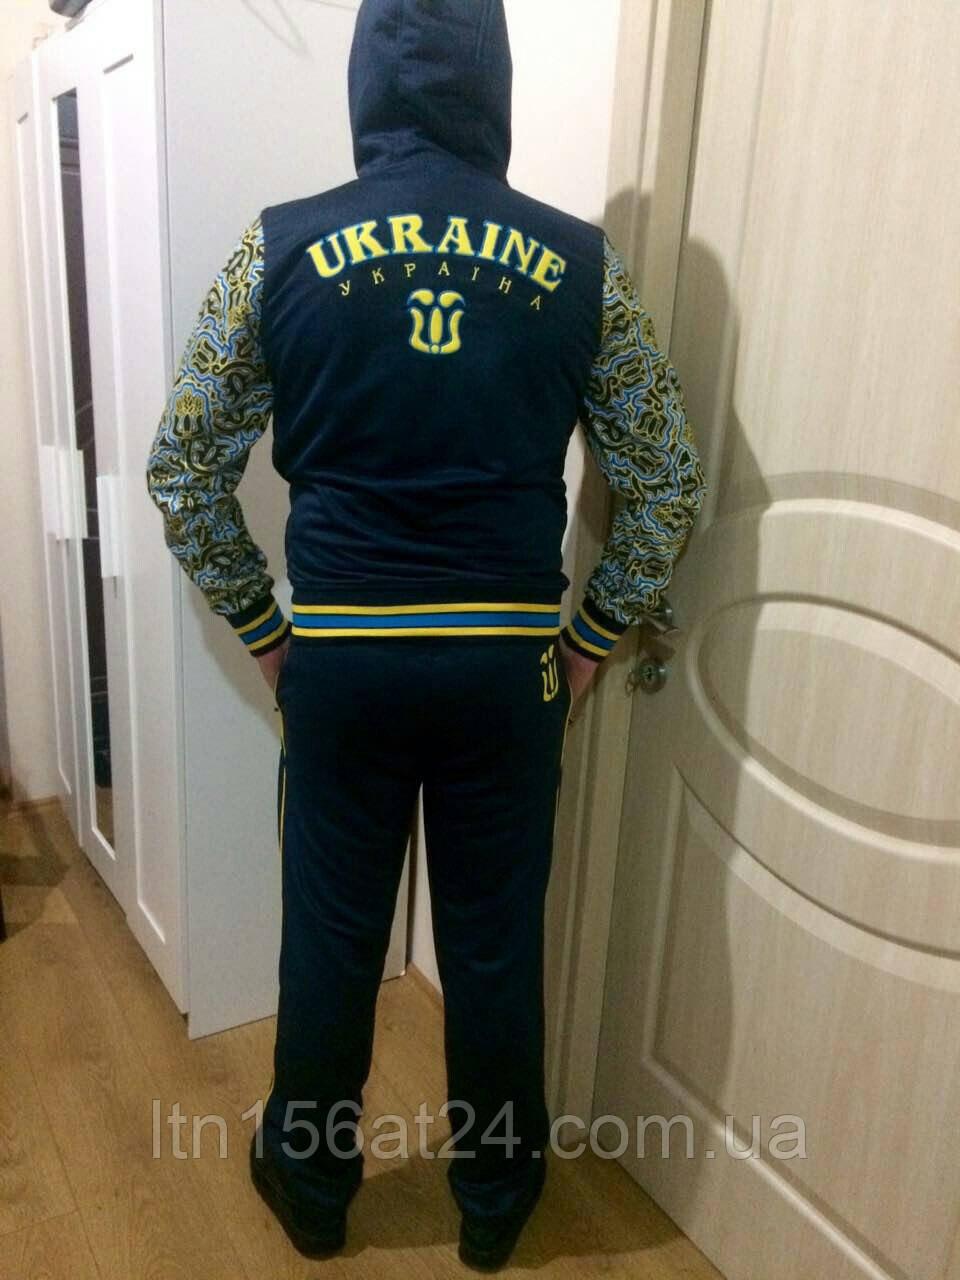 e1f4432e Спортивные костюмы Bosco Sport Украина оригинал - NEWLCD (LCD Экраны) тел.  +380672409835